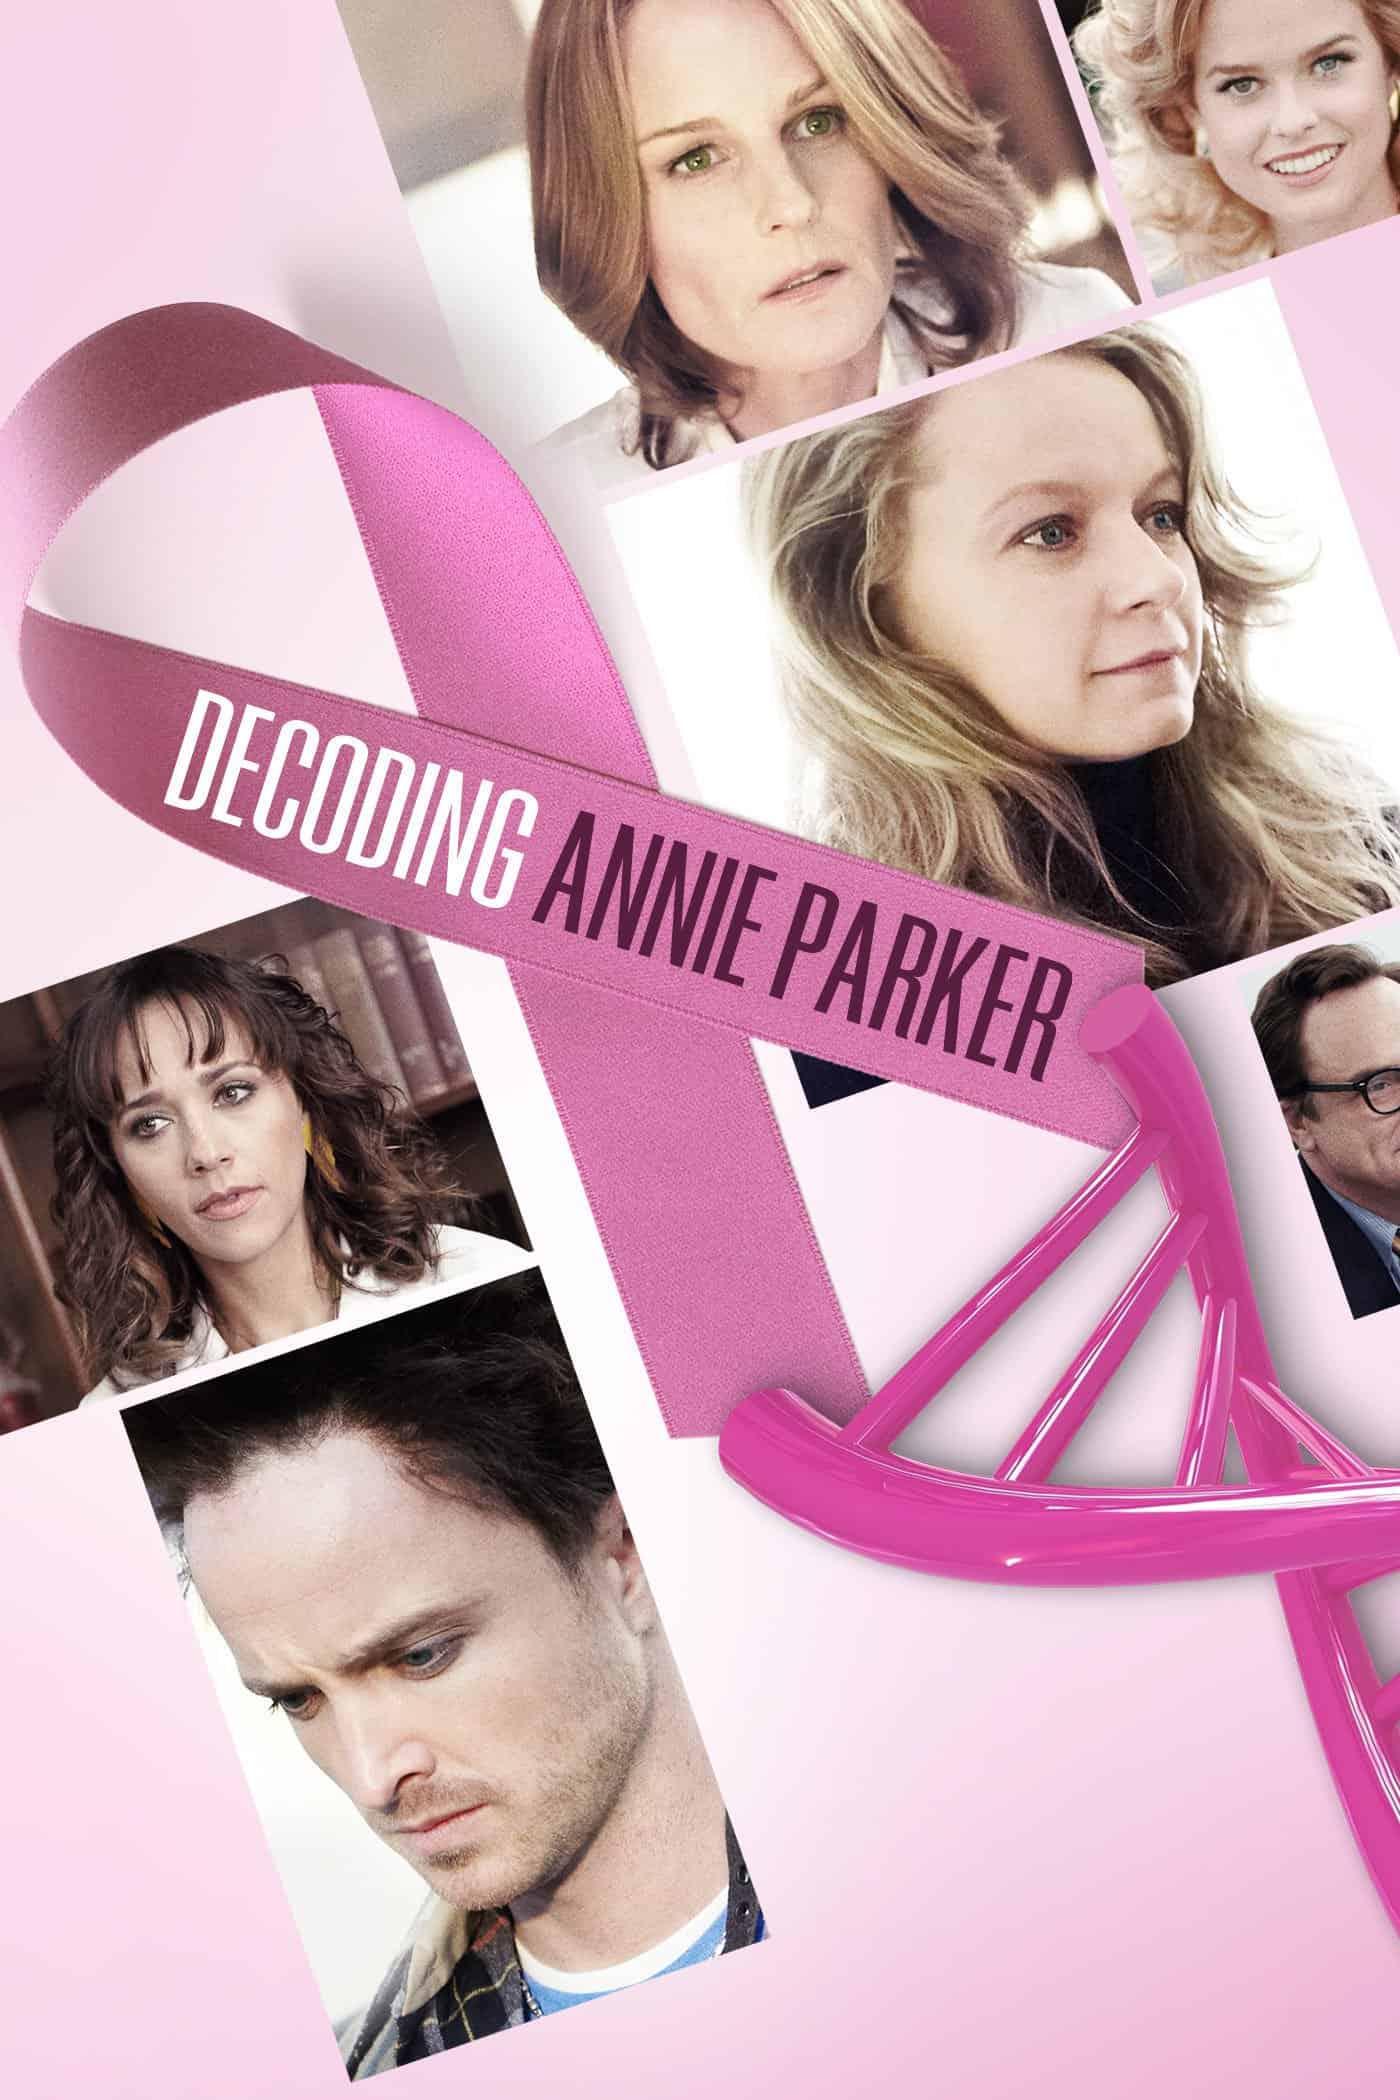 Decoding Annie Parker, 2013